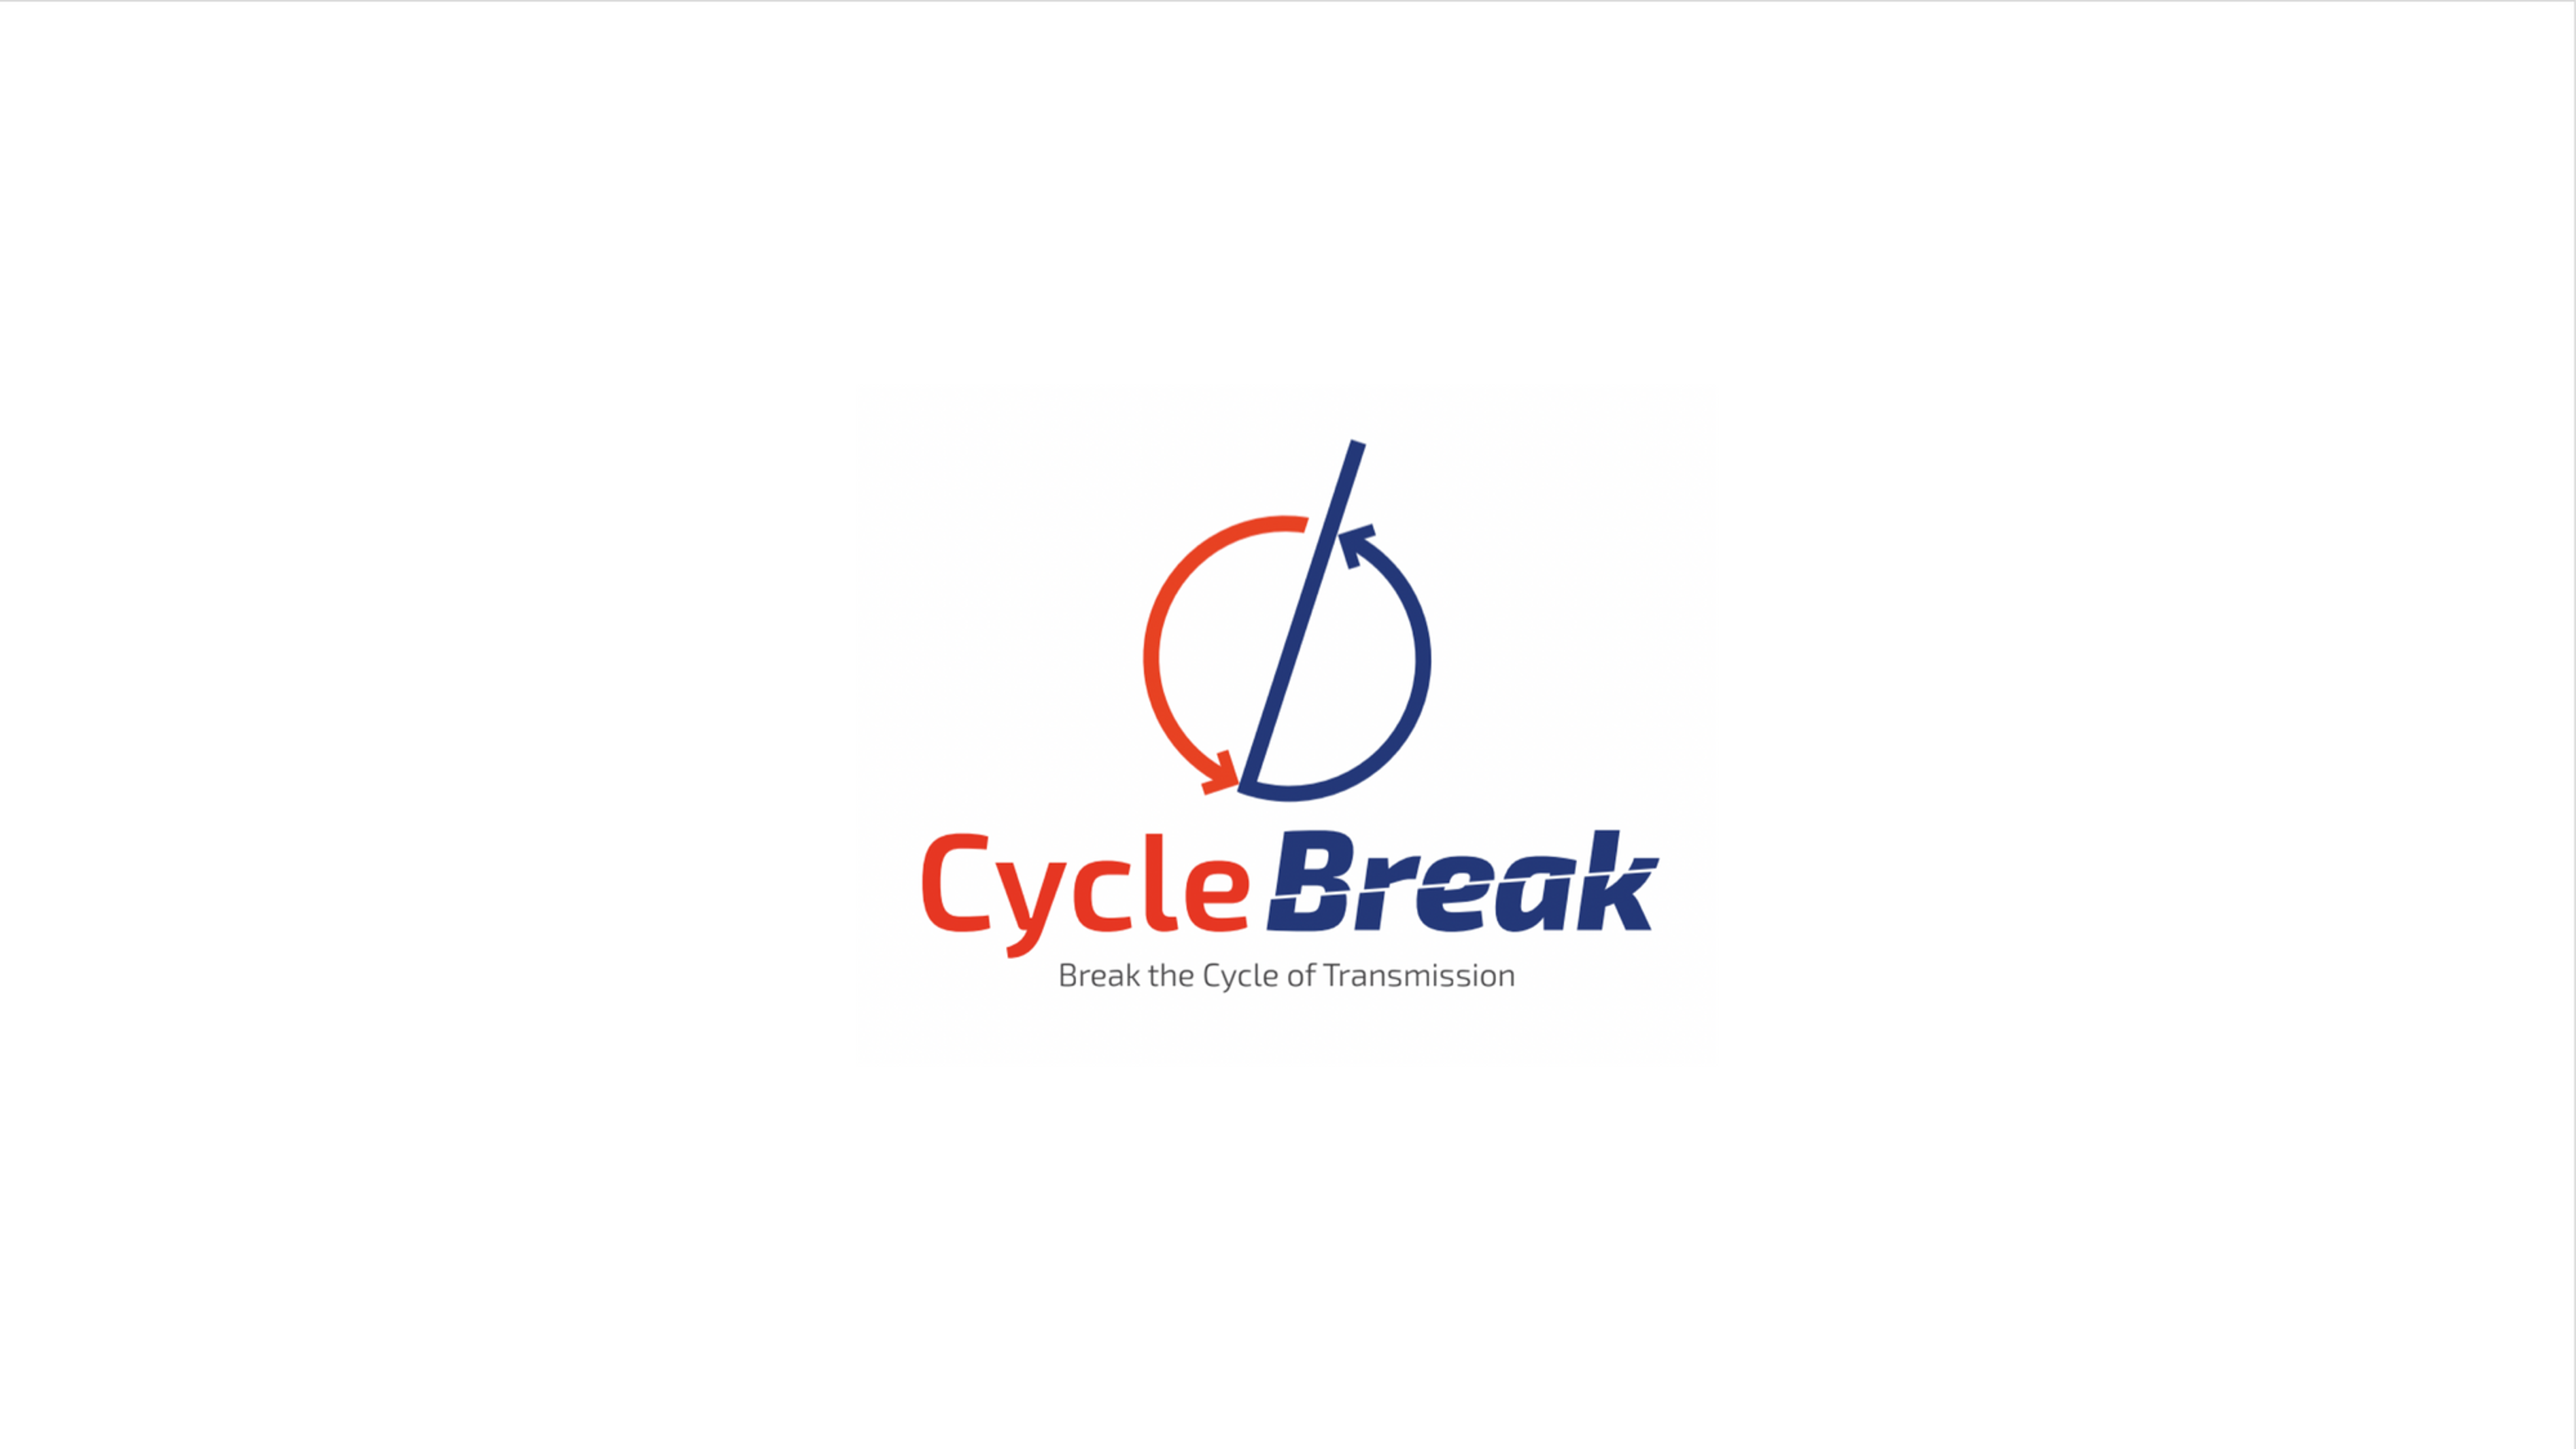 CycleBreak - Proactive Contact Tracing